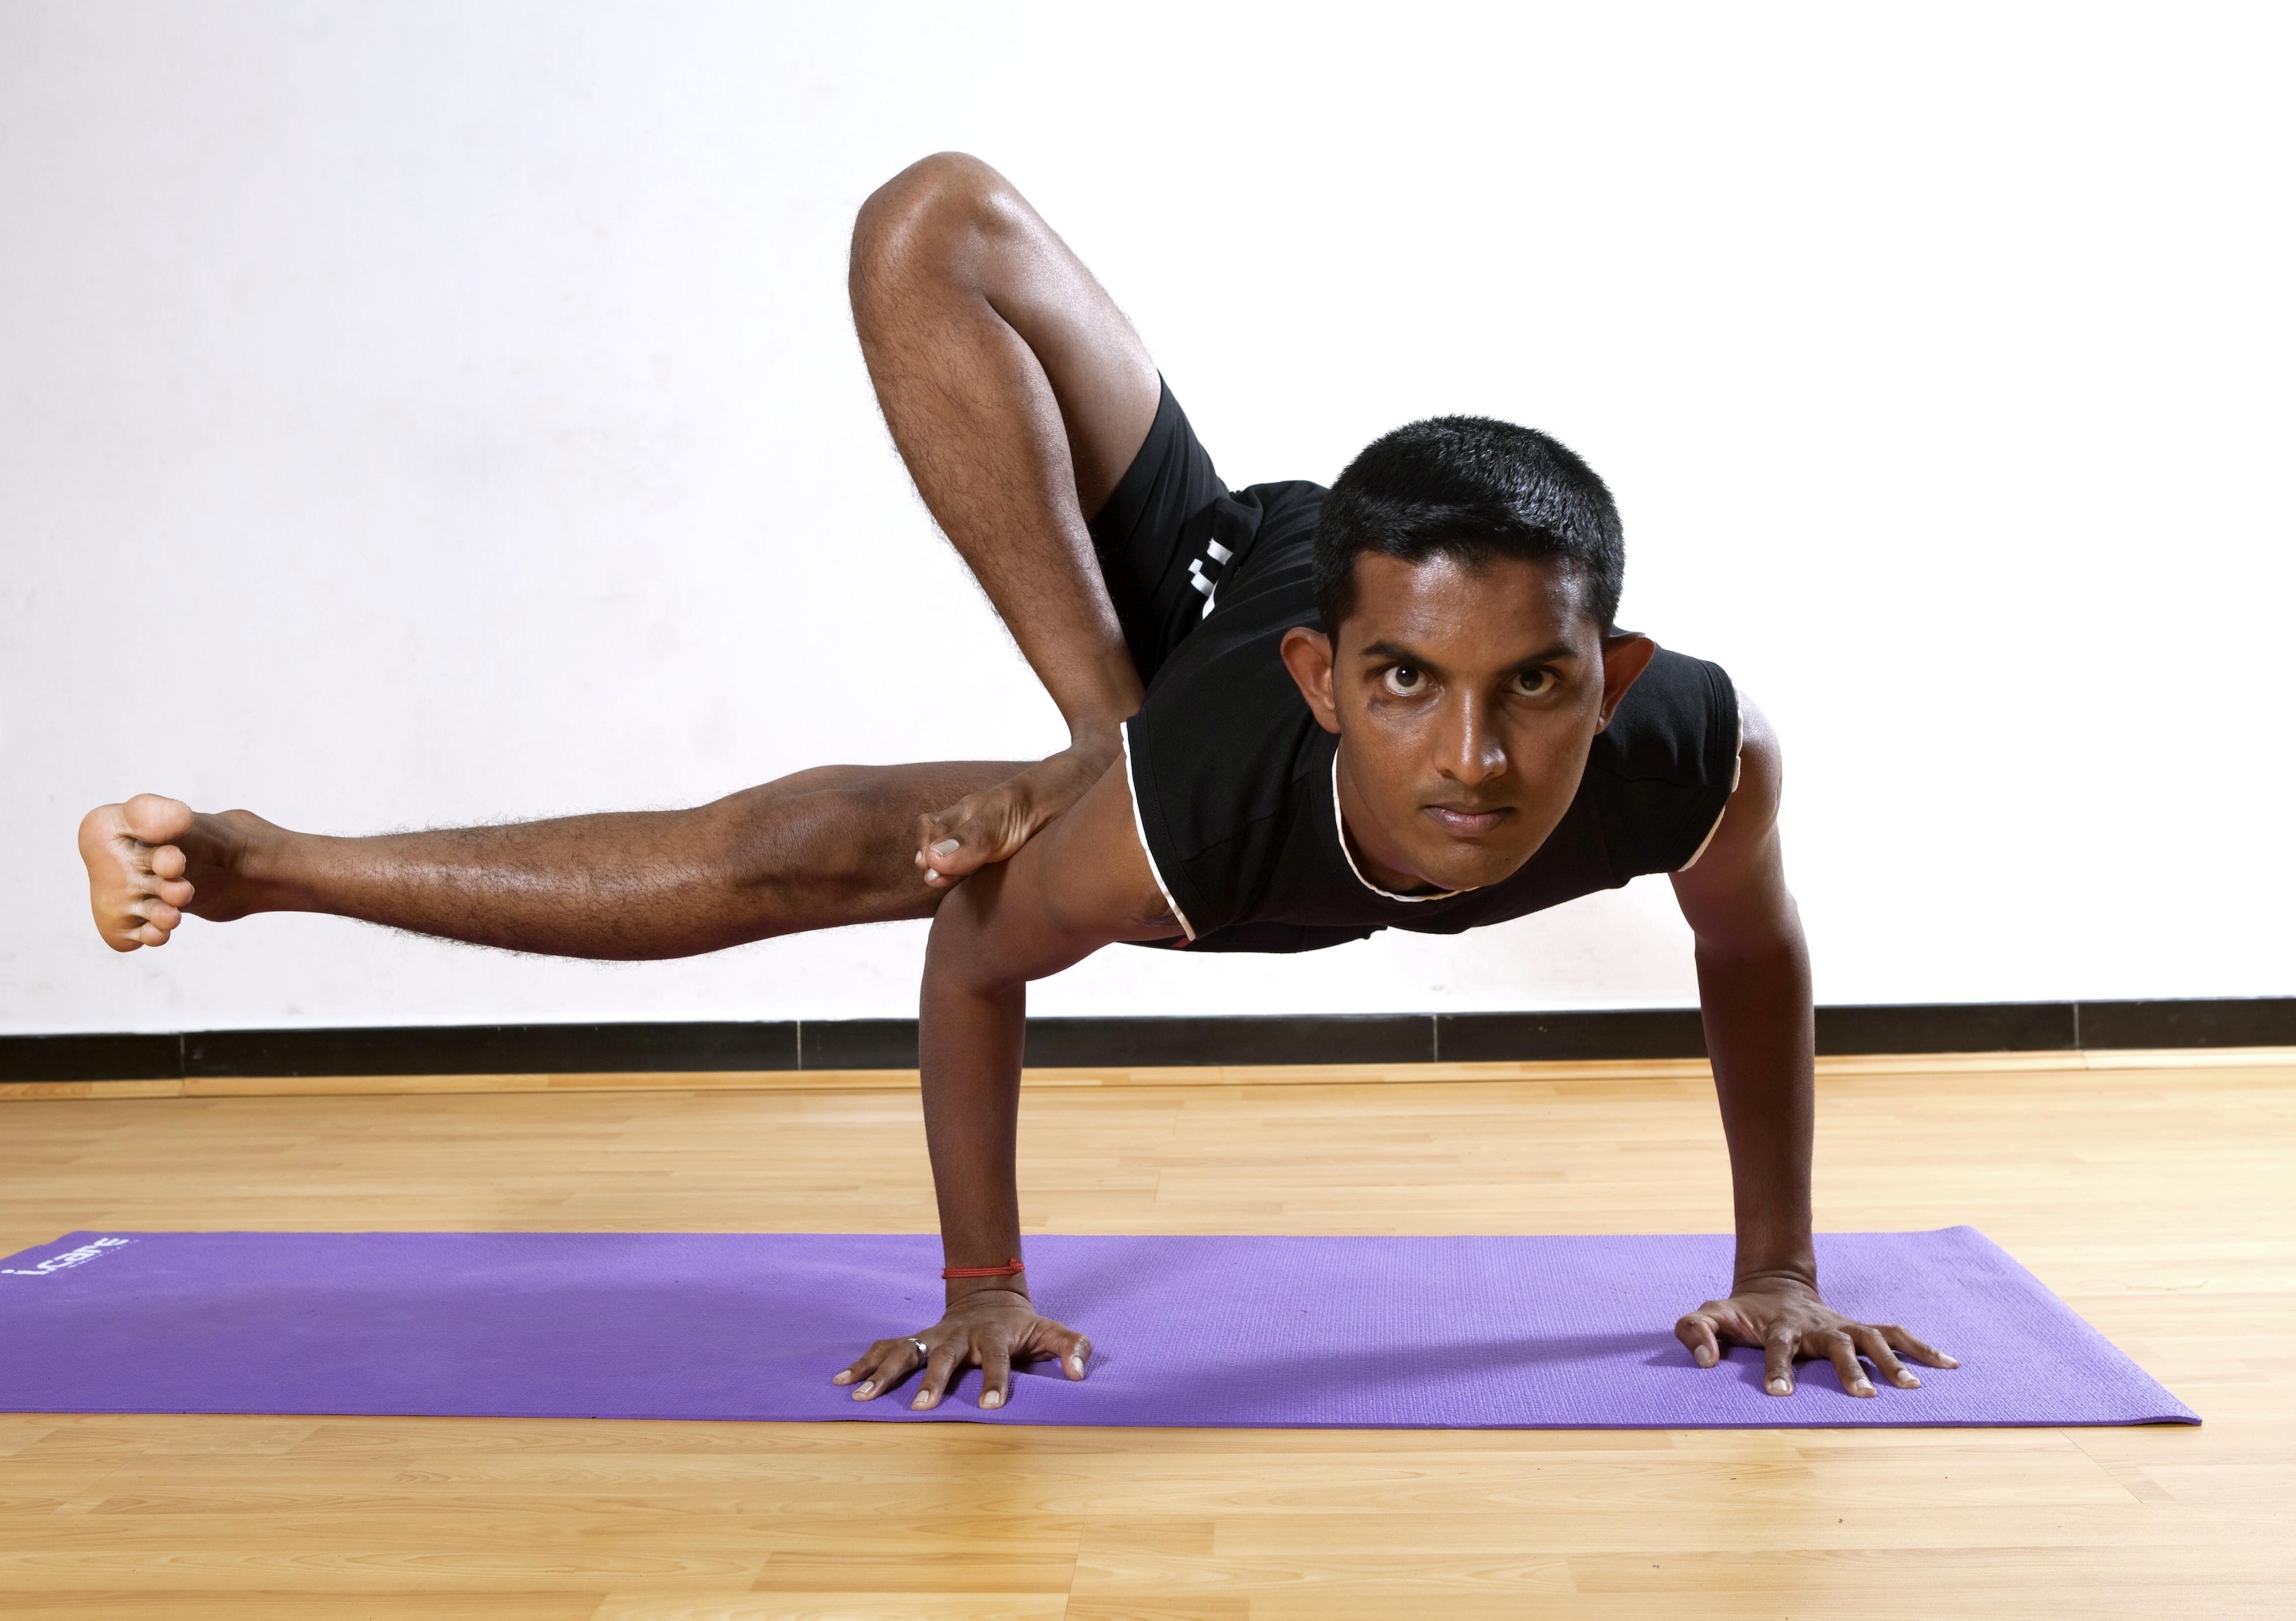 Advanced Two Person Yoga Poses